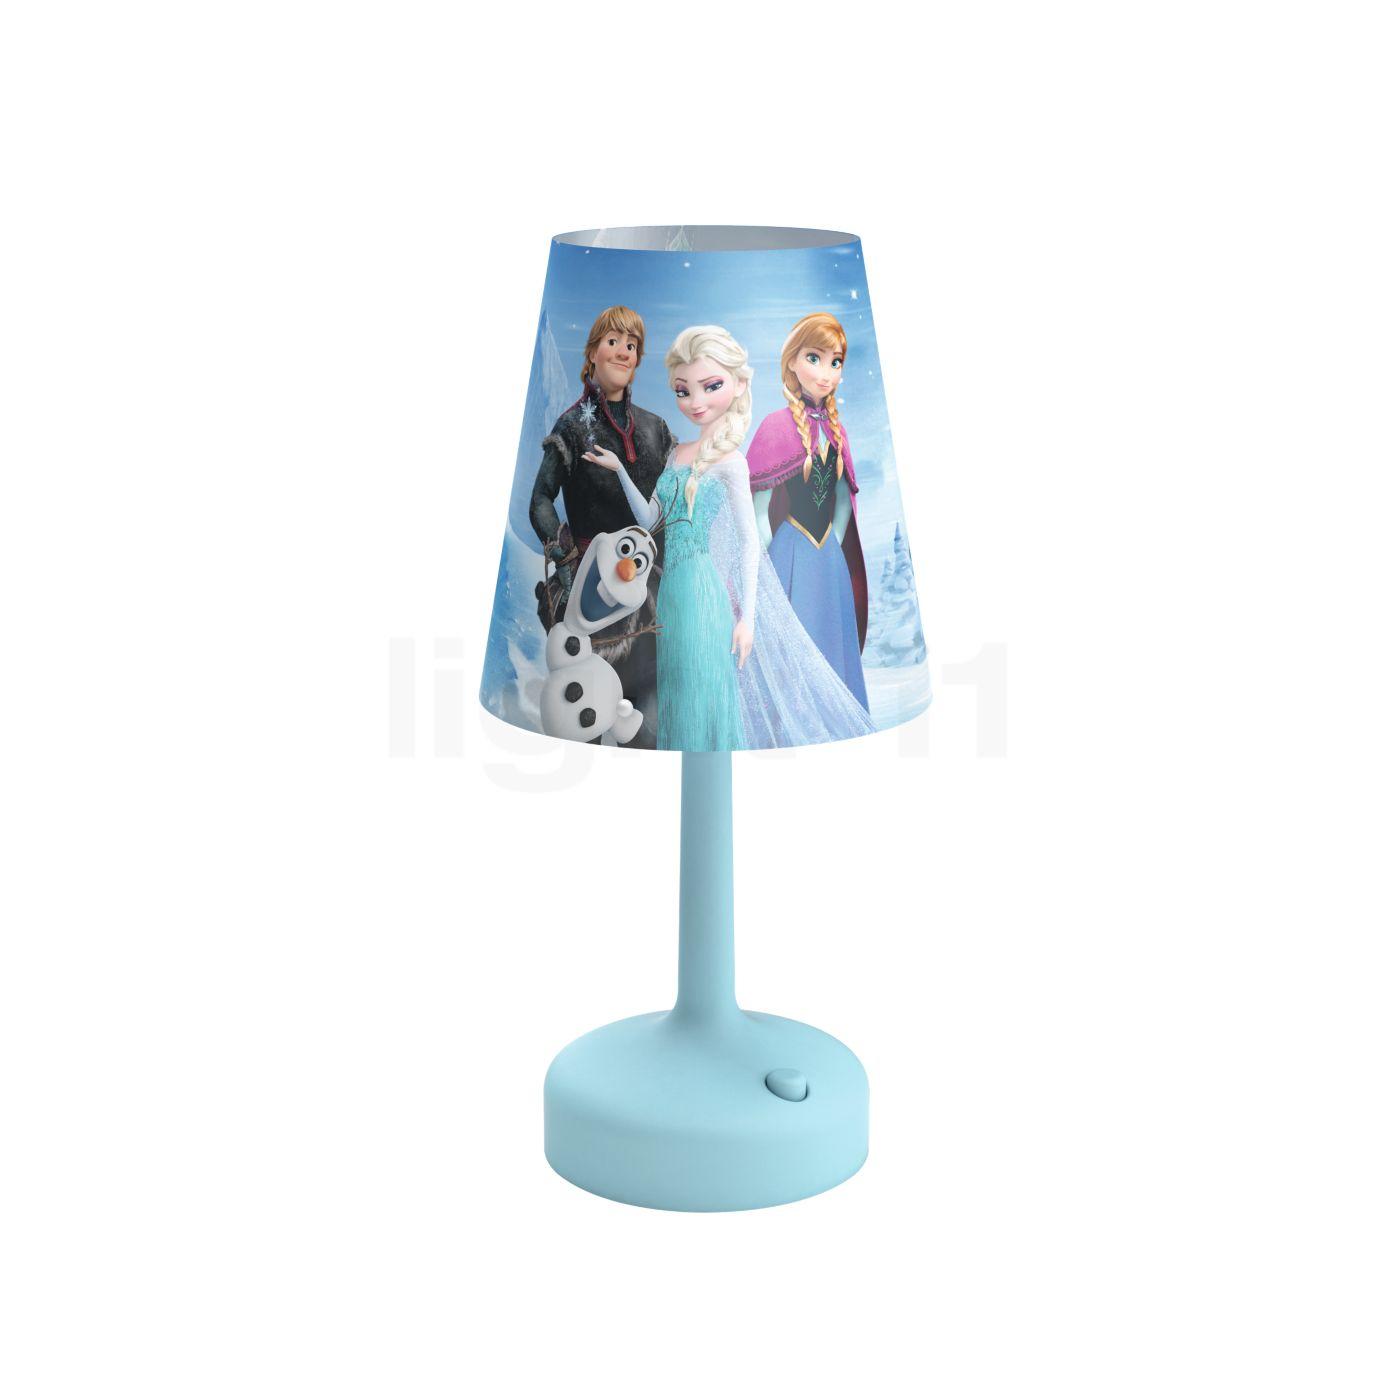 Philips Disney Frozen Bedside lamp LED Table lamp